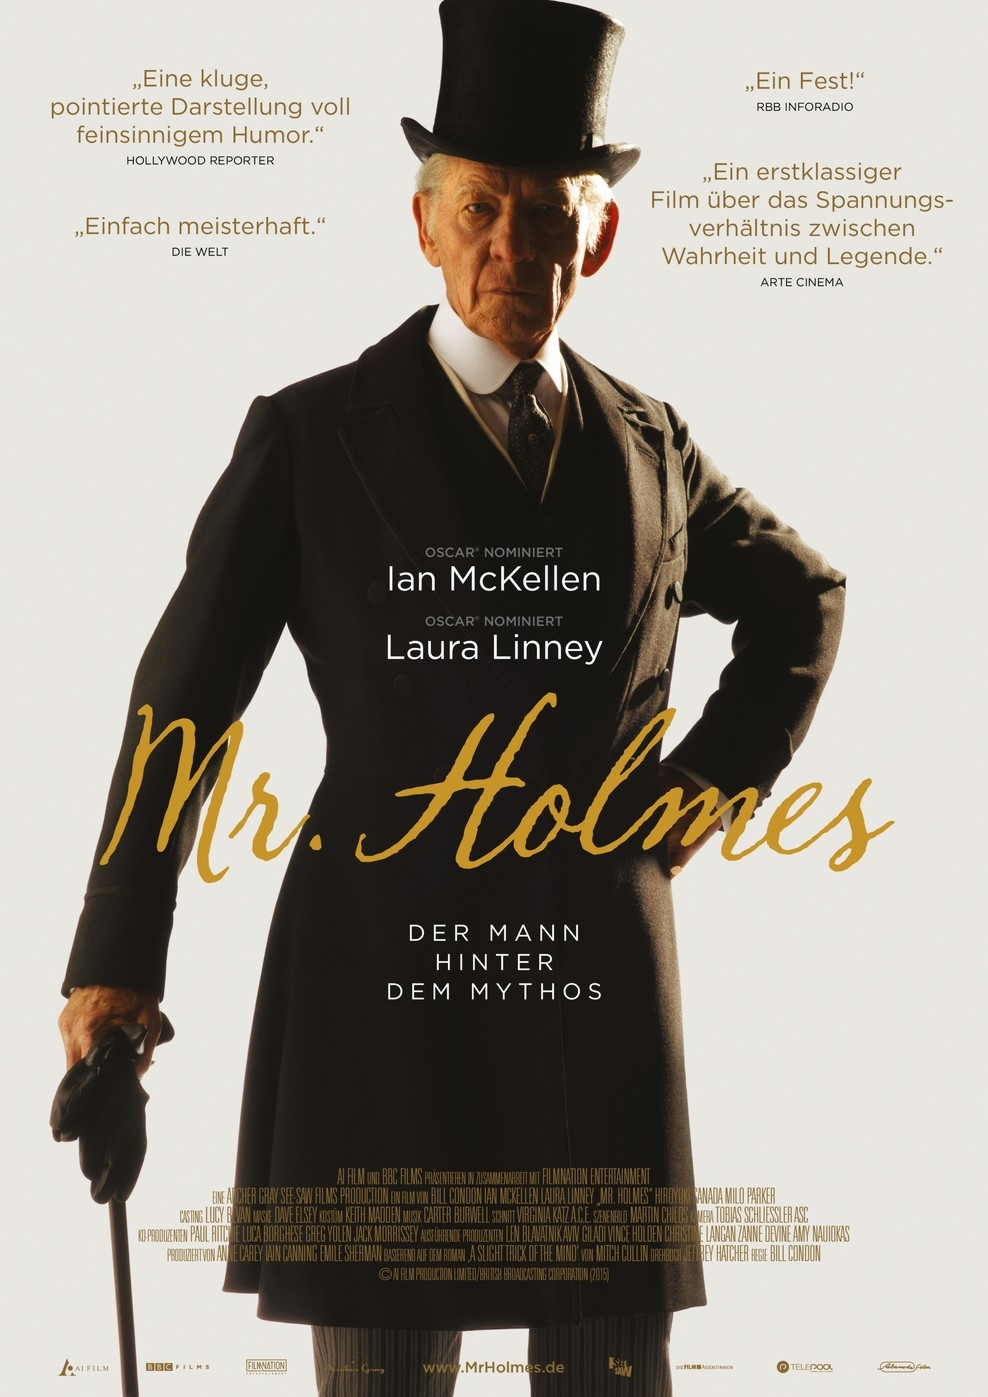 Mr. Holmes (Poster)